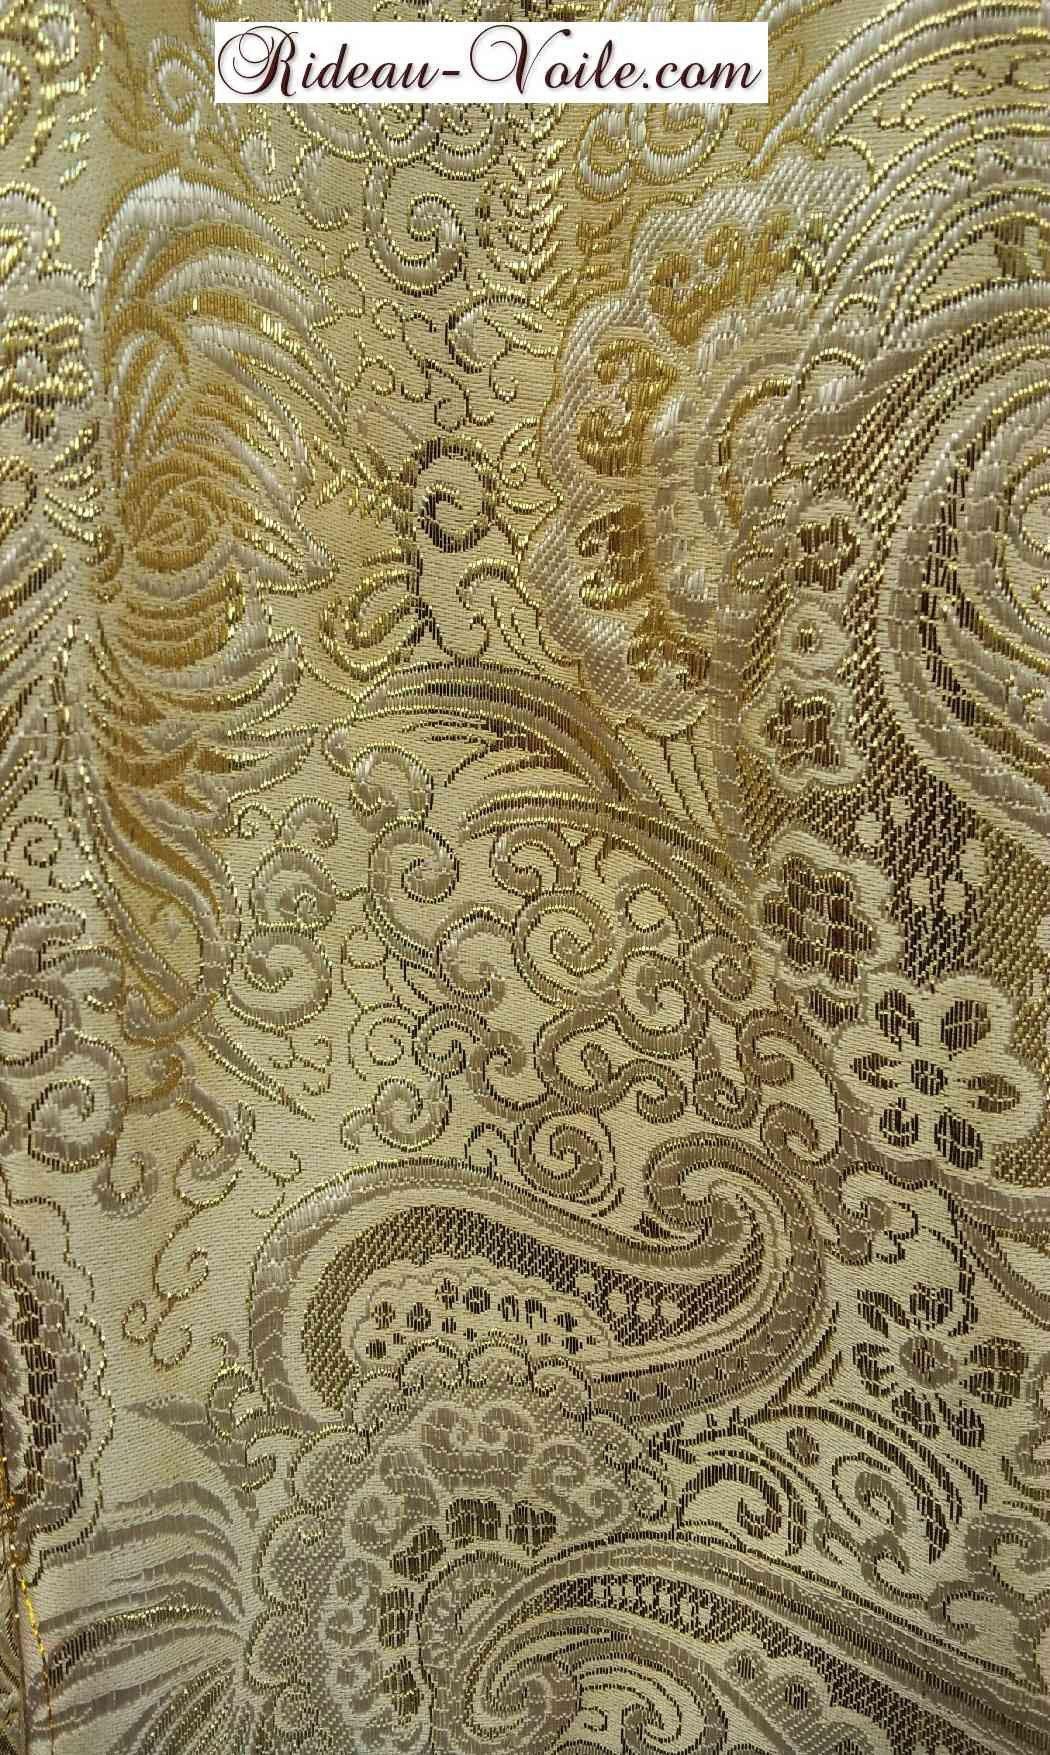 rideau brocart haut gamme jaune or